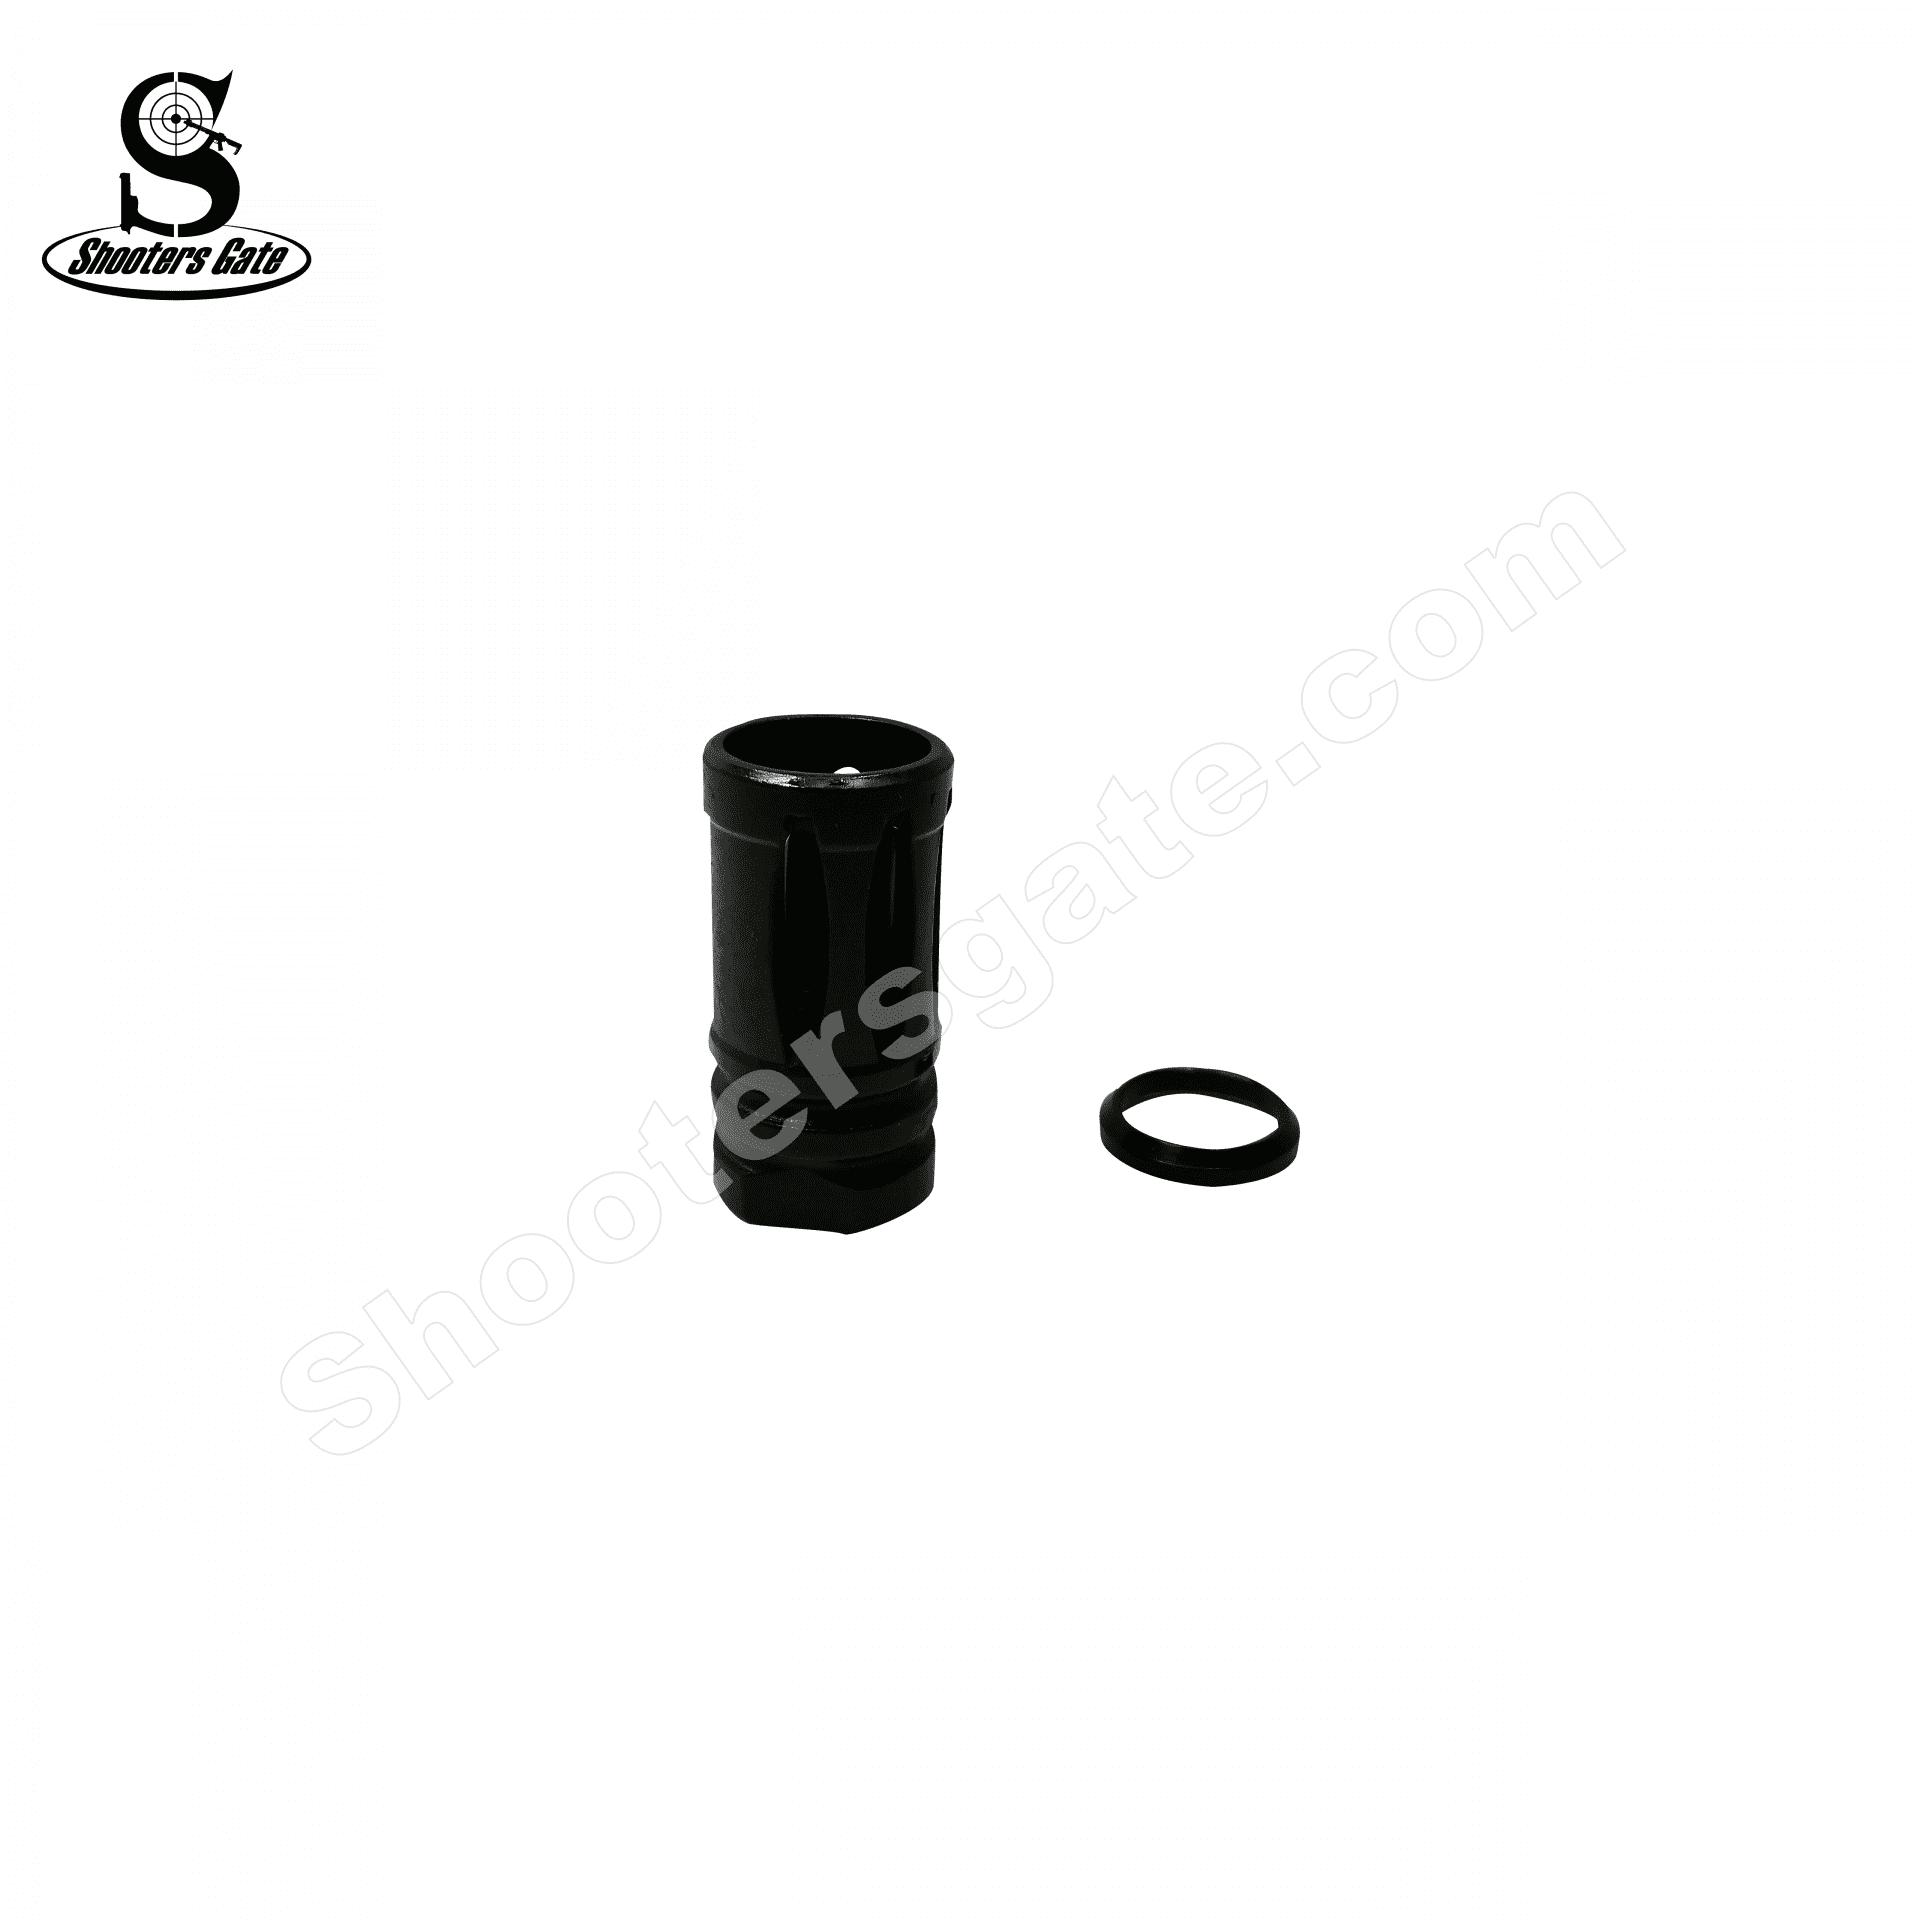 AR10 .308/AR15 300Blackout Birdcage with Crush Washer 5/8x24 Thread, Black